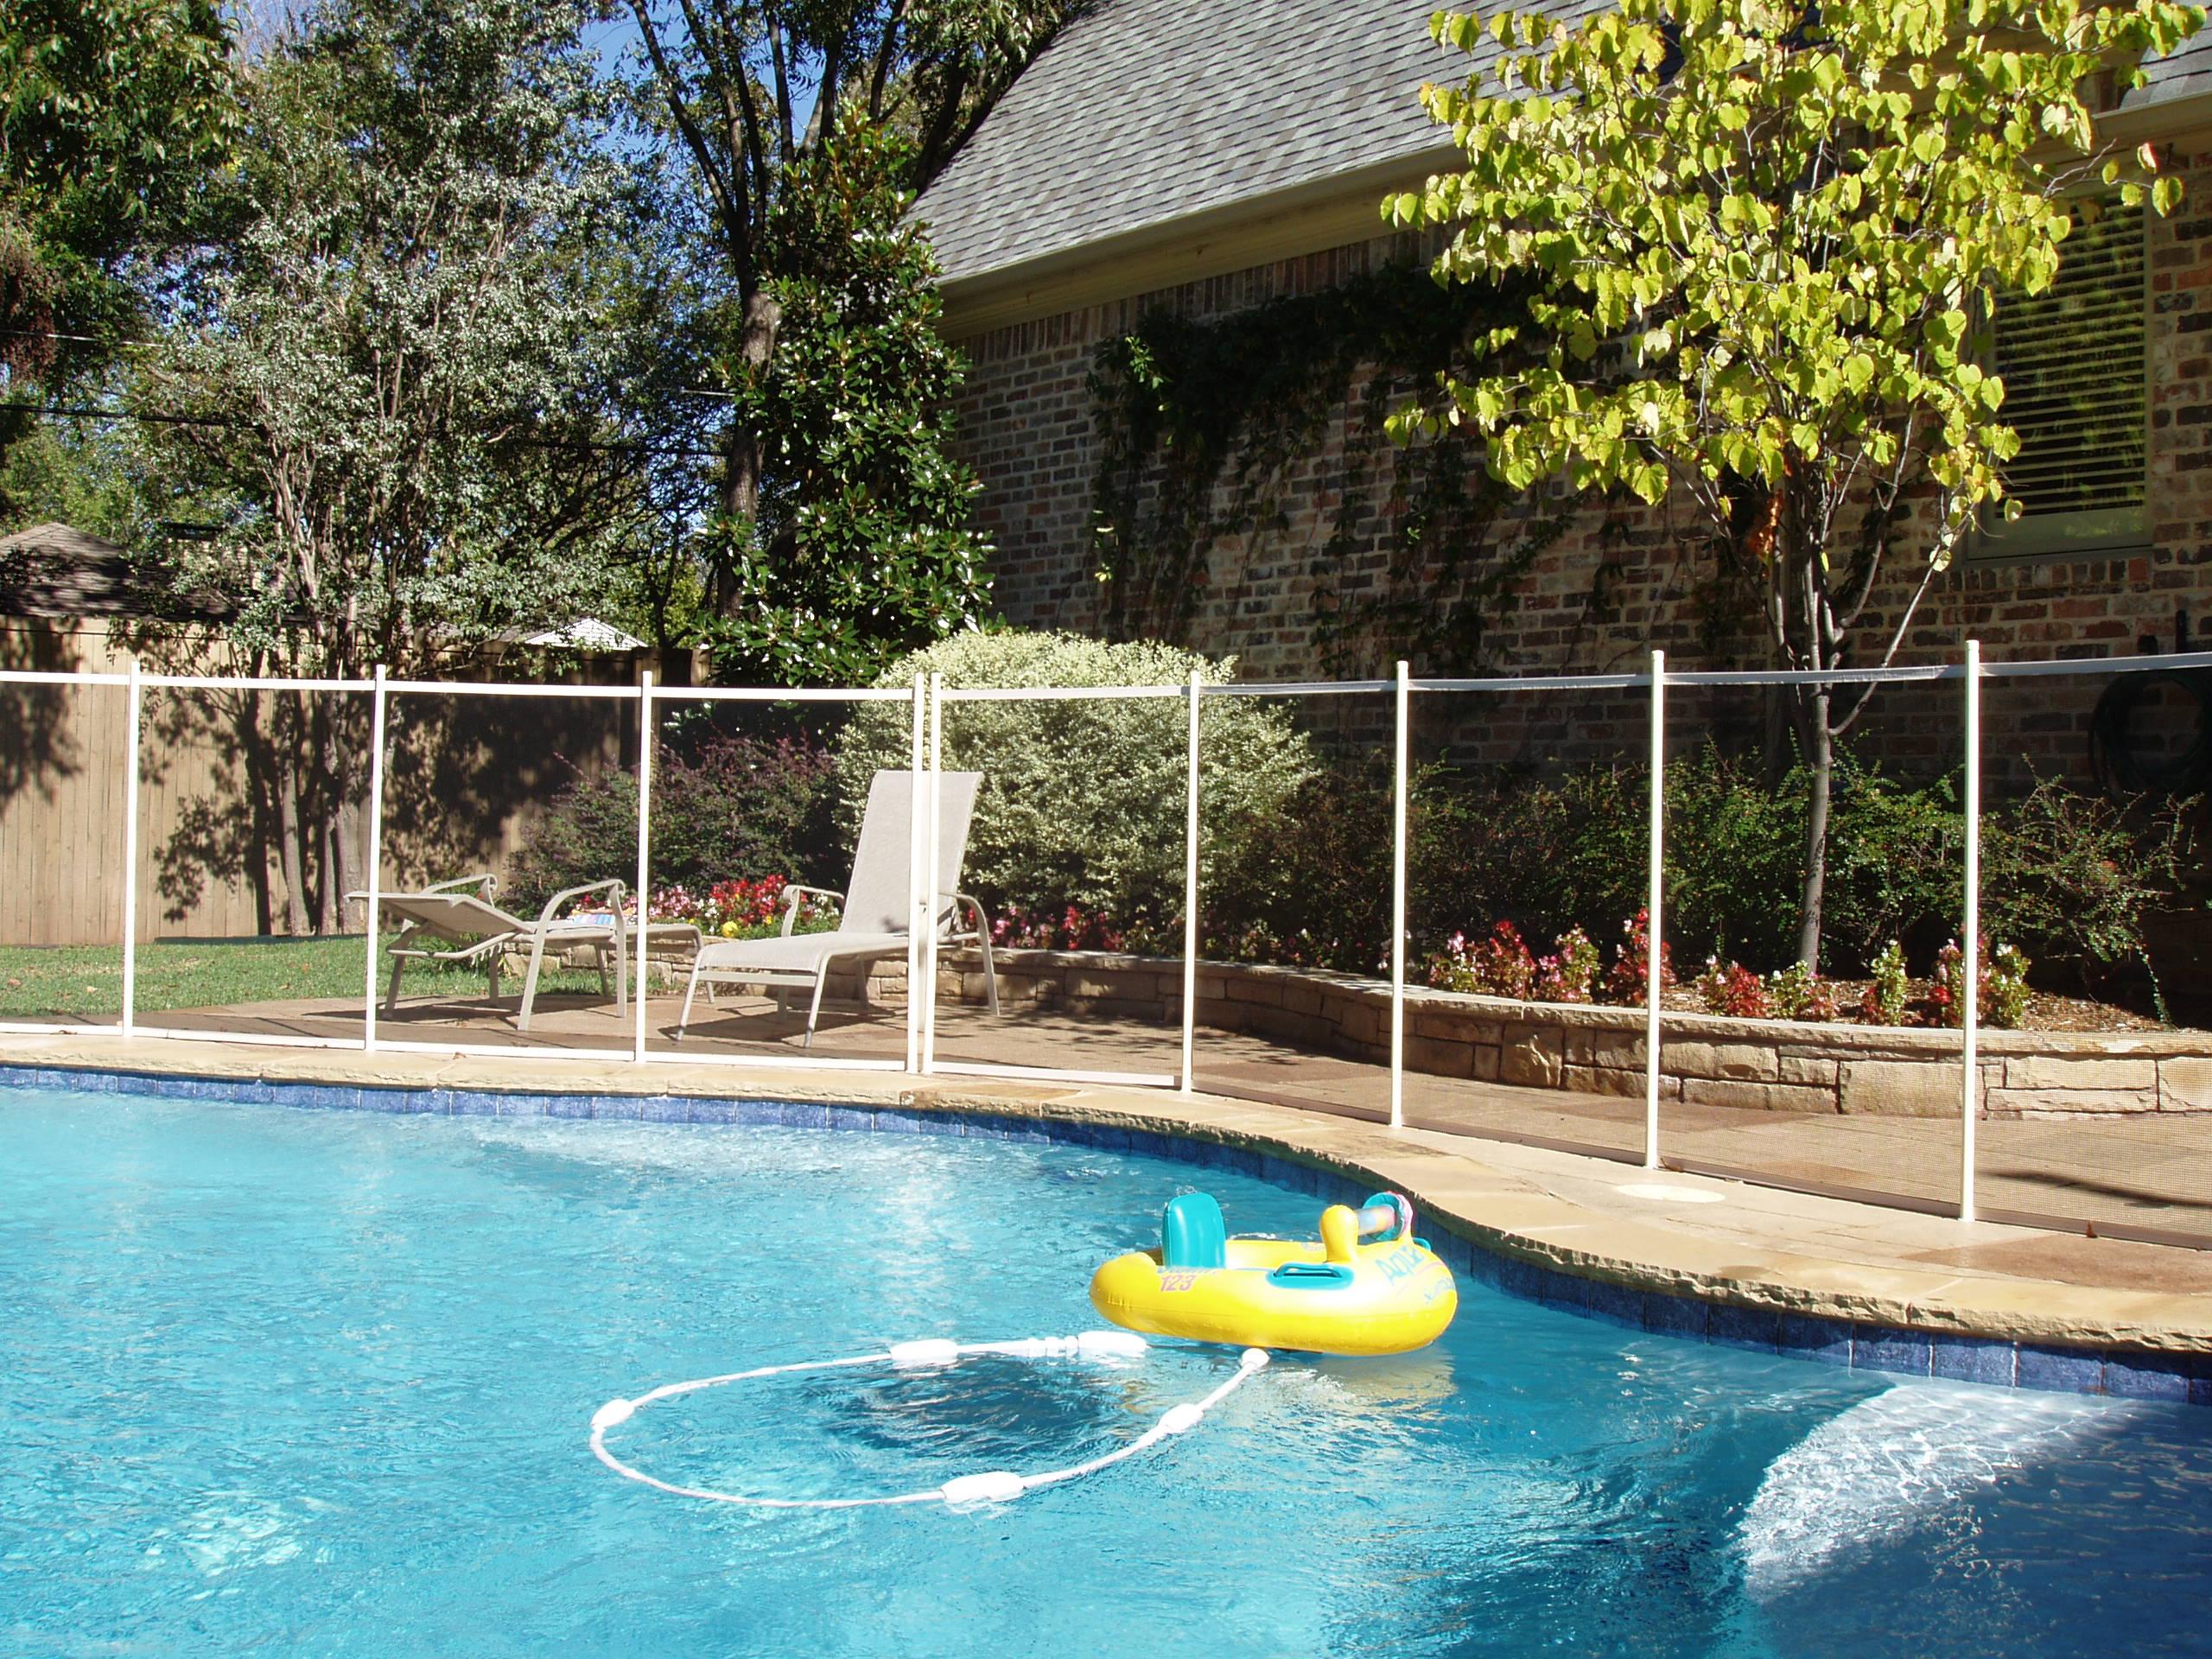 checklist for pool season